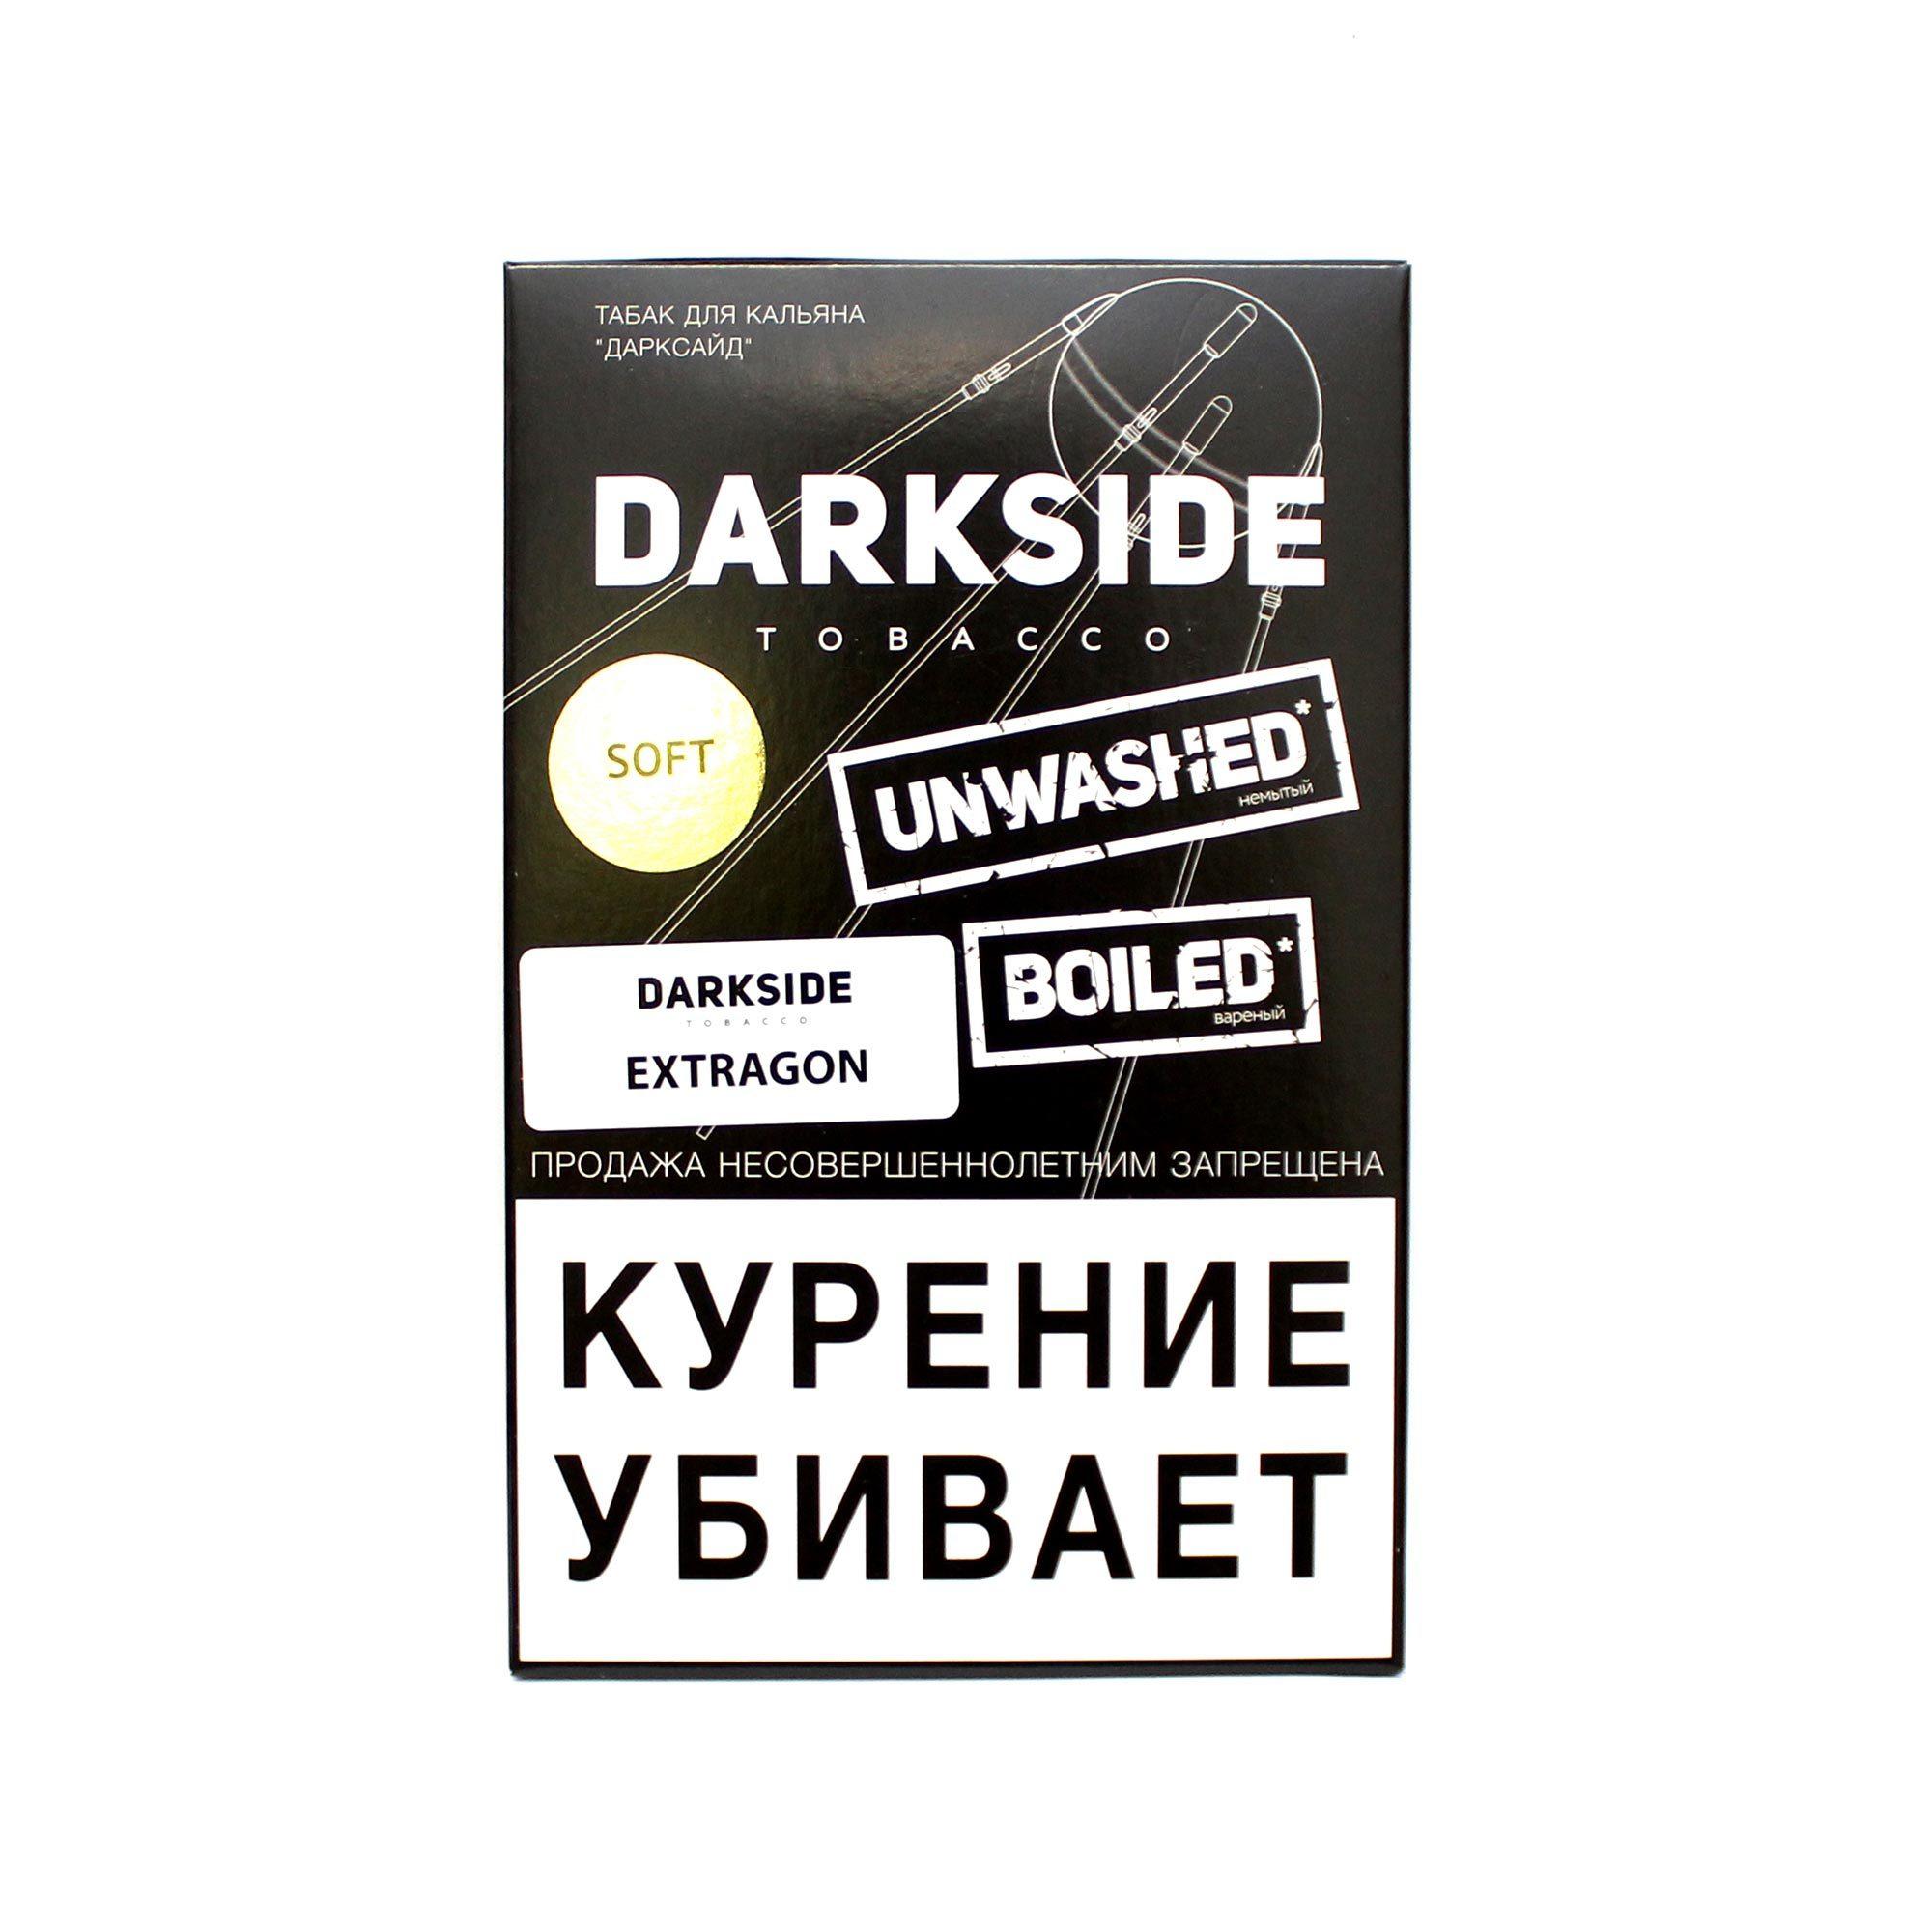 Табак для кальяна Dark Side Soft 100 гр. Extragon